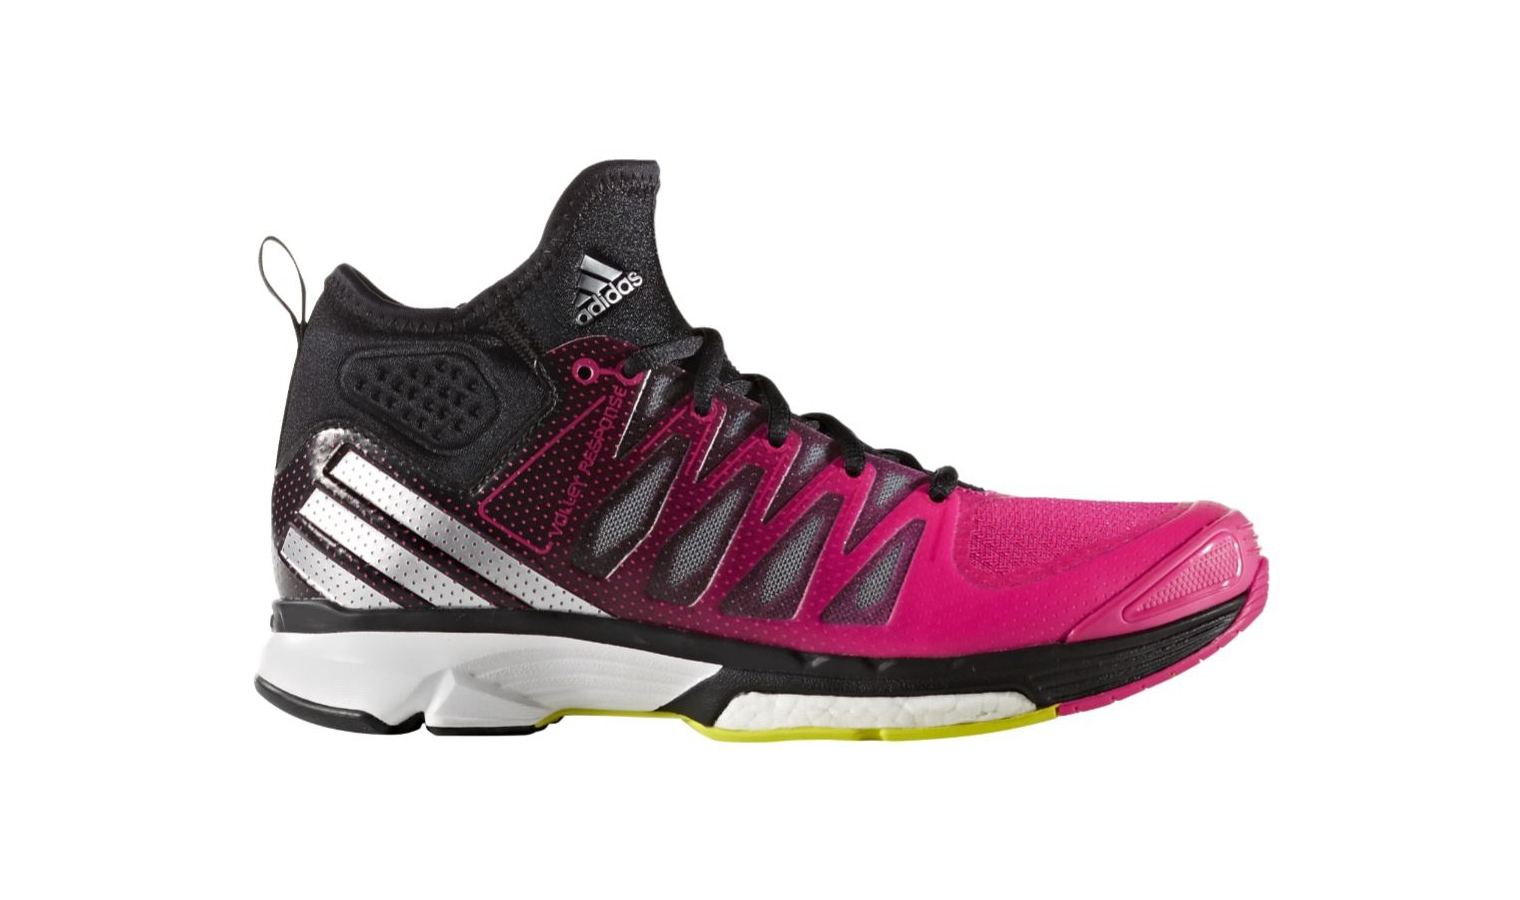 Dámské volejbalové boty adidas VOLLEY RESPONSE BOOST 2 MID W  f5df67f22b6